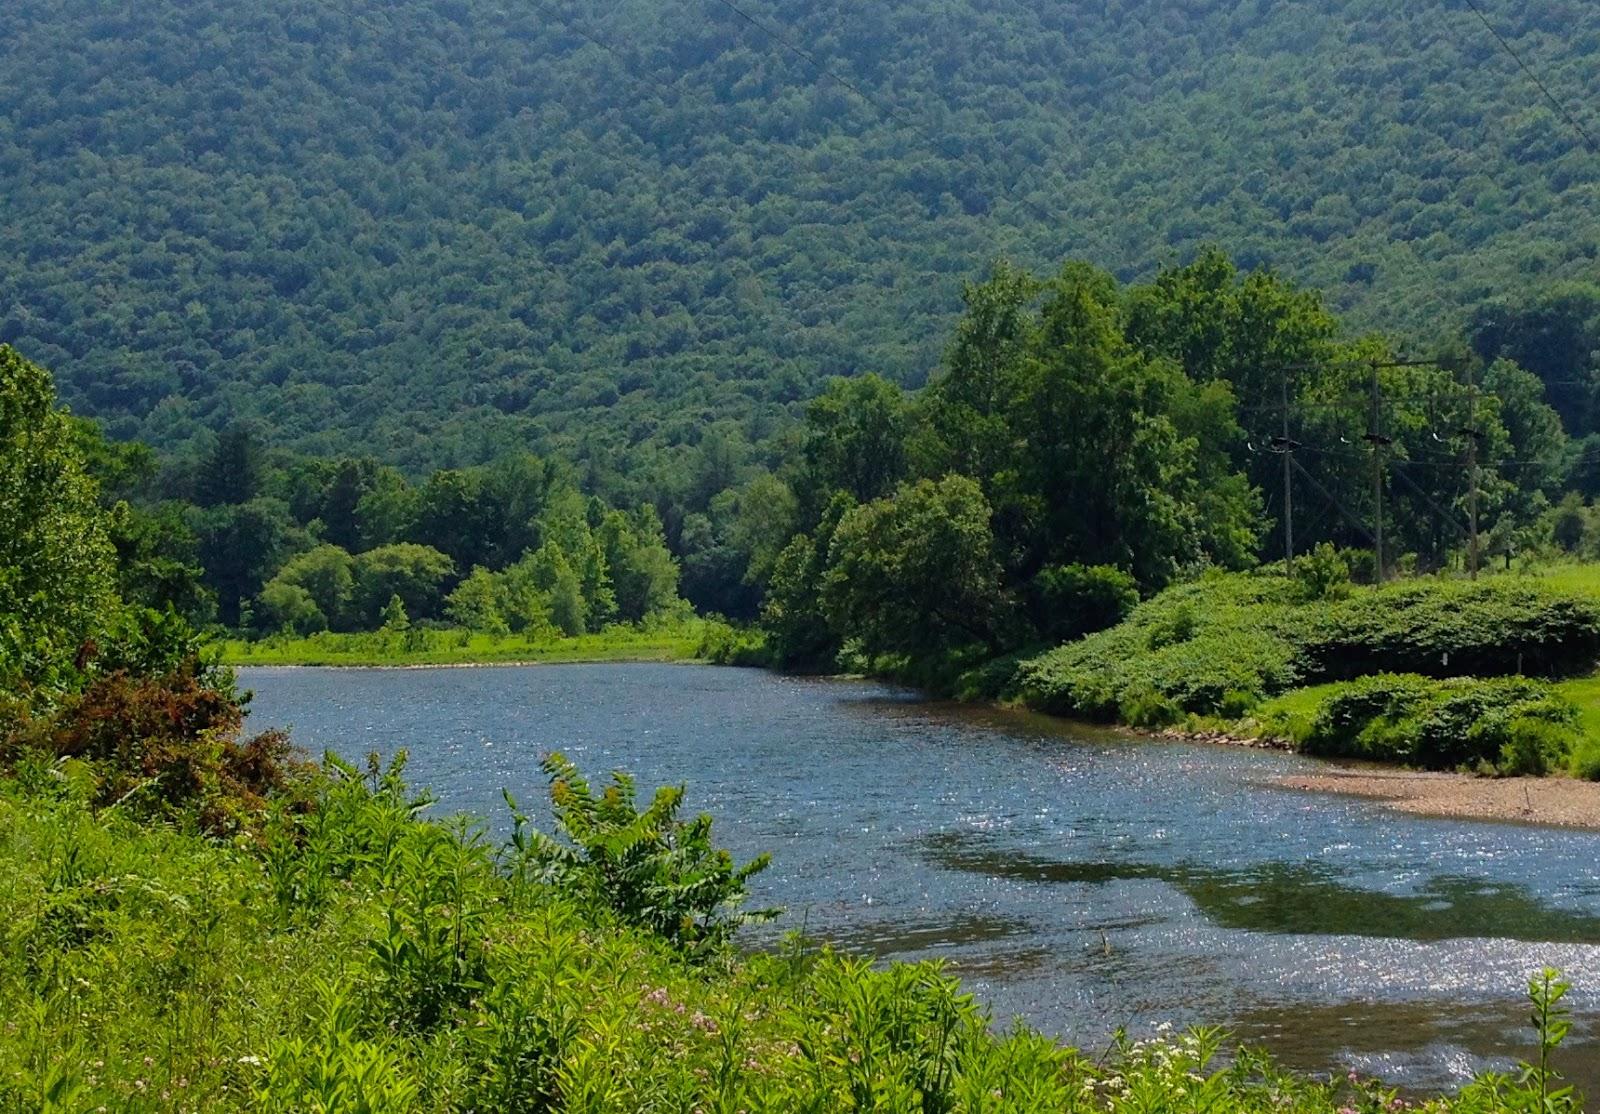 Rail Trail Guidebook Captures Essence Of Pine Creek Valley